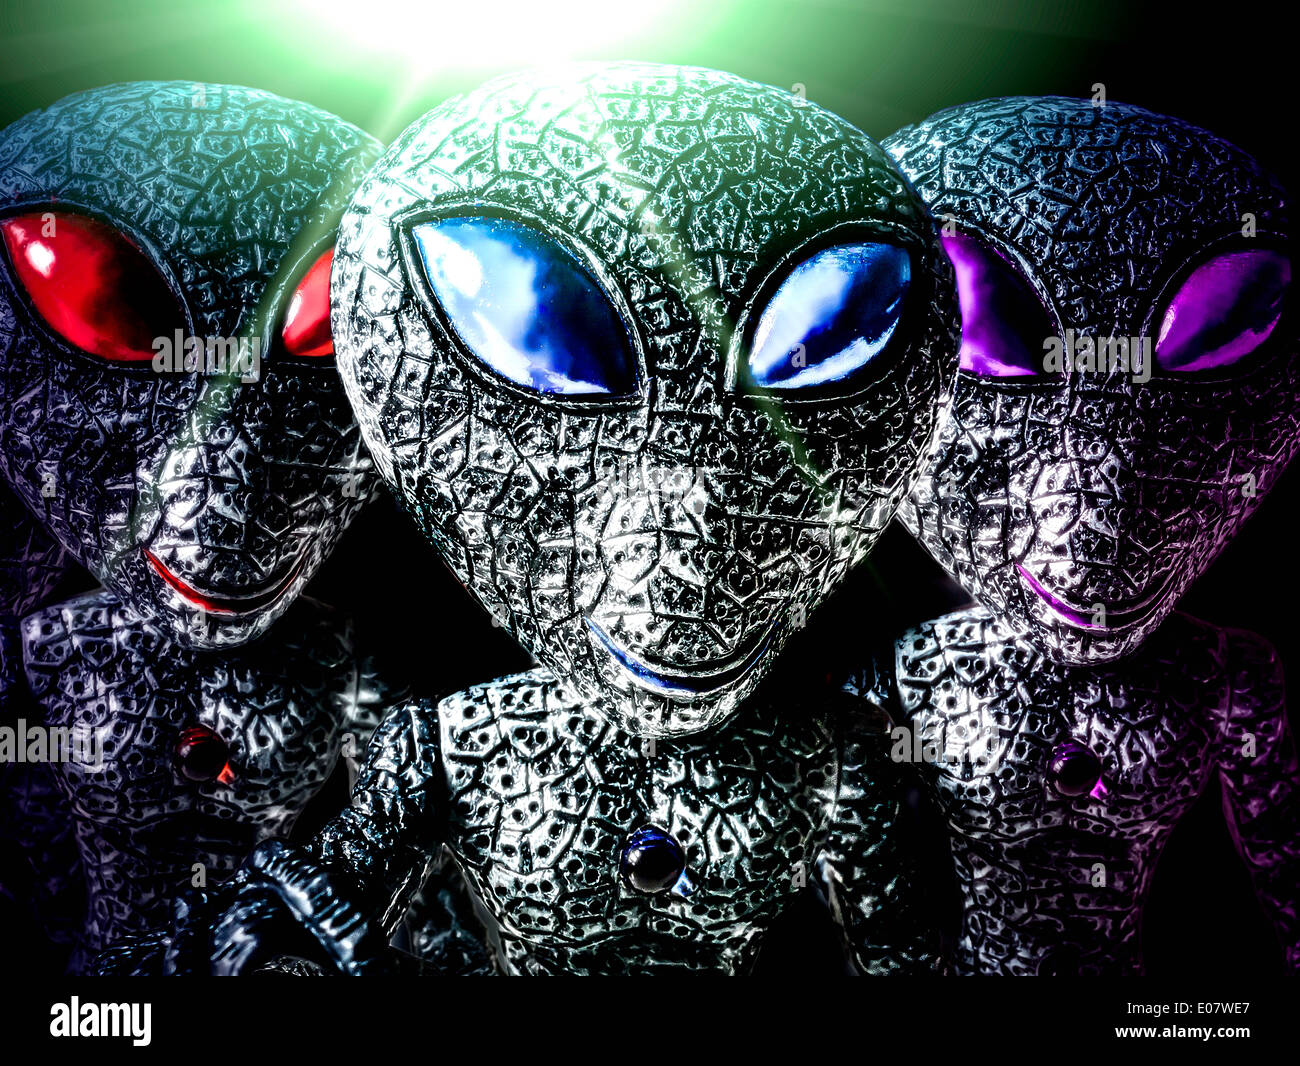 Alien Spielzeug Stockbild